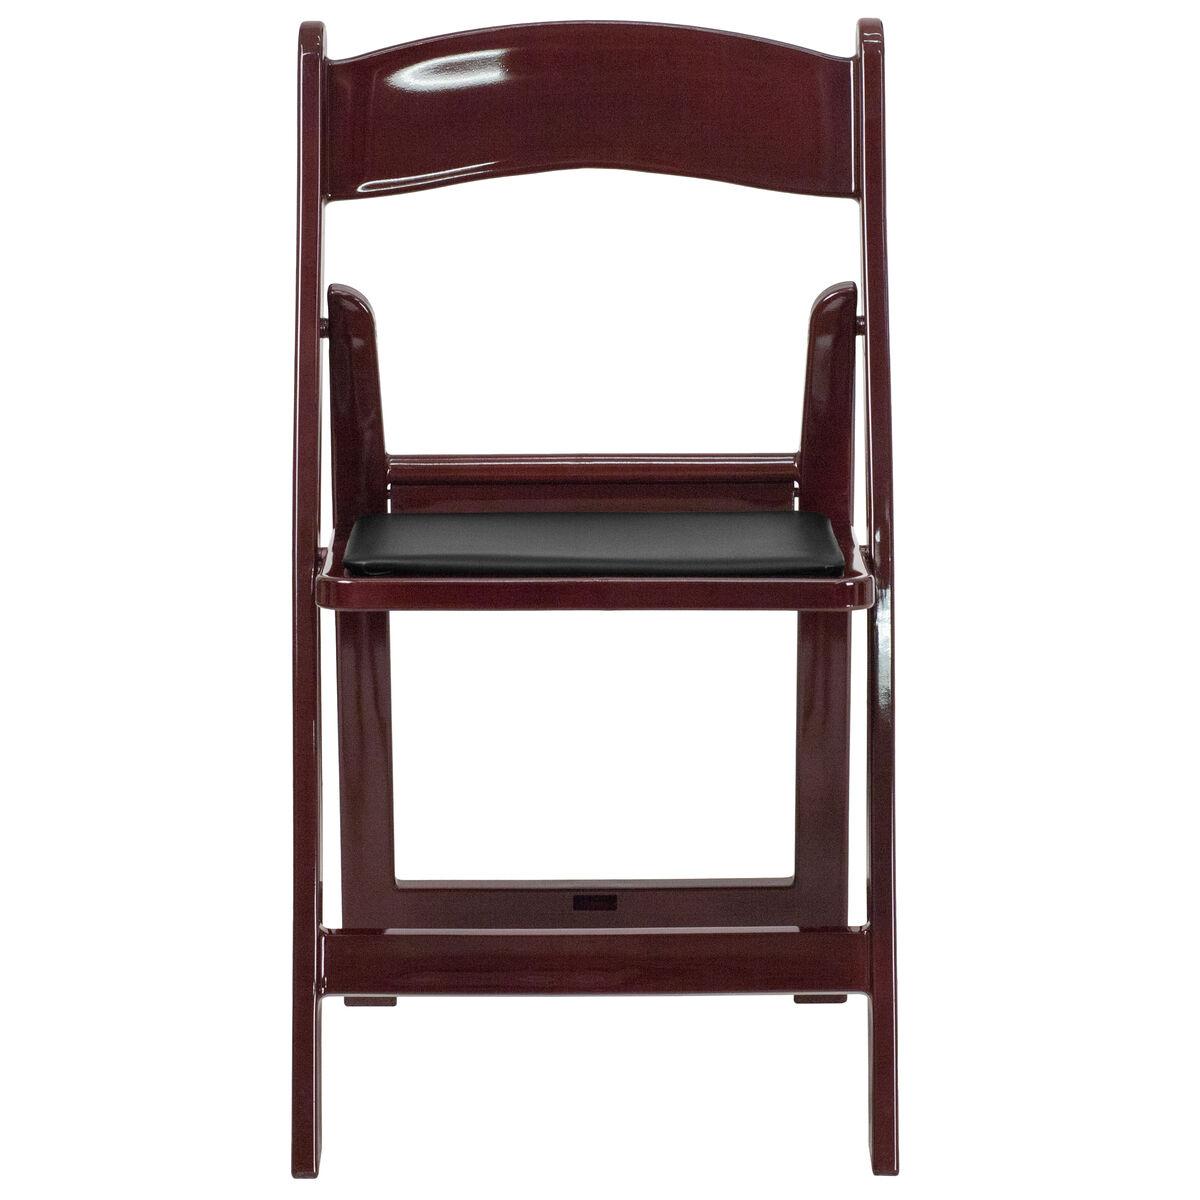 Enjoyable Hercules Series 1000 Lb Capacity Red Mahogany Resin Folding Chair With Black Vinyl Padded Seat Bralicious Painted Fabric Chair Ideas Braliciousco